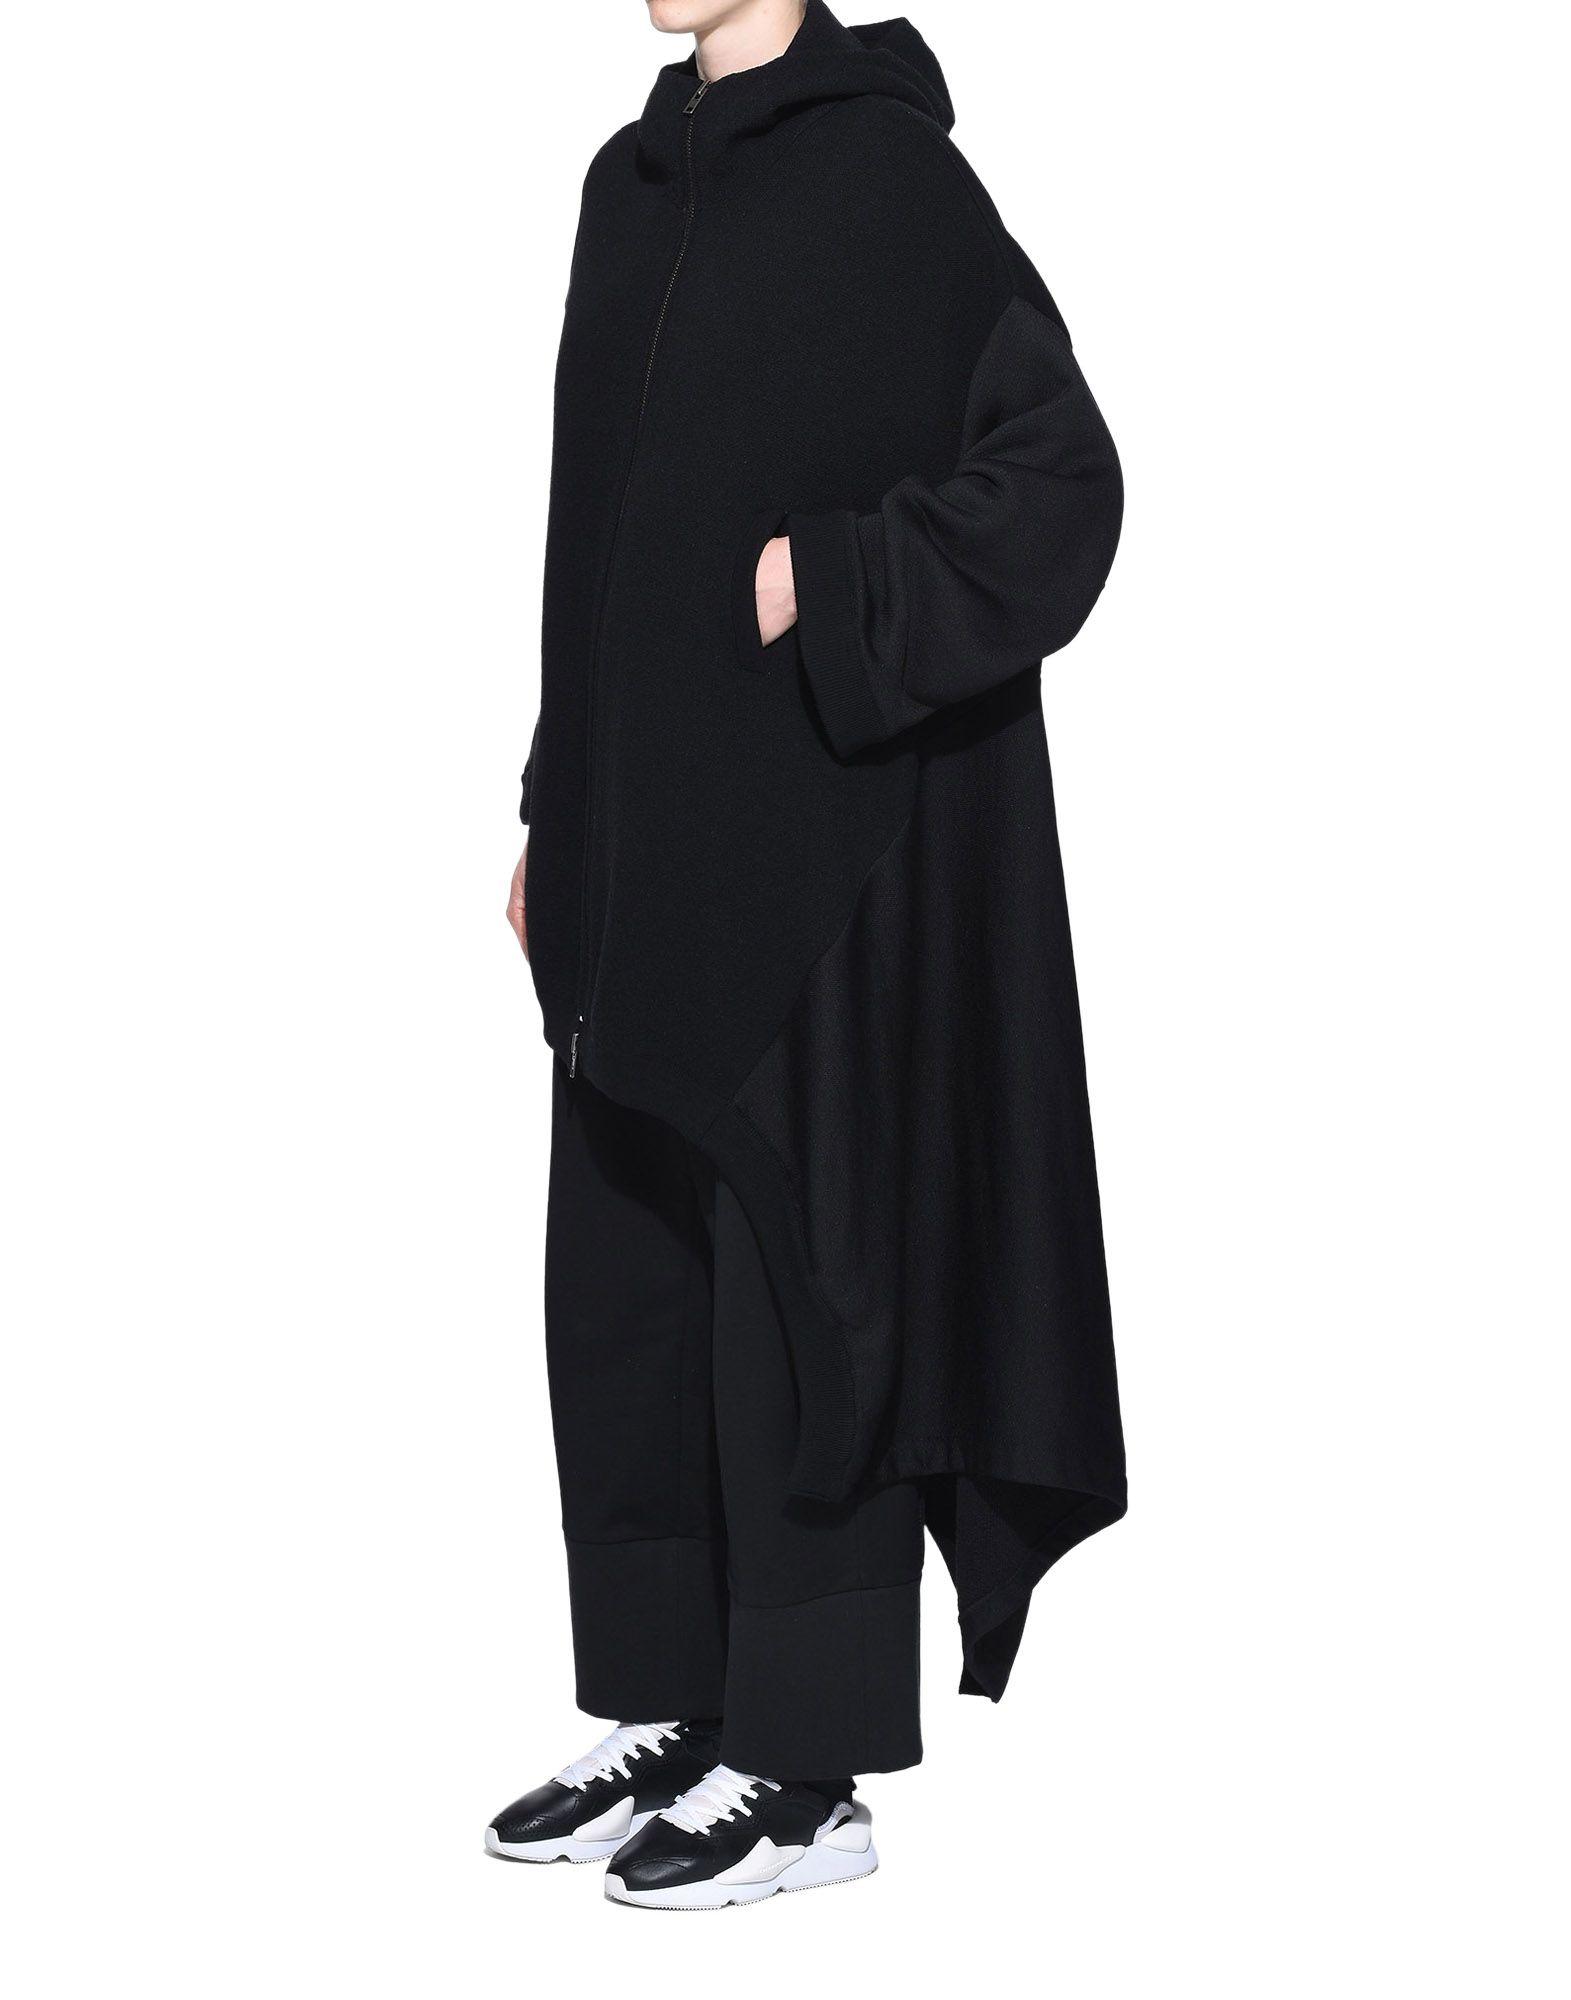 Y-3 Y-3 Knitted Hoodie Dress Vestito corto Donna e